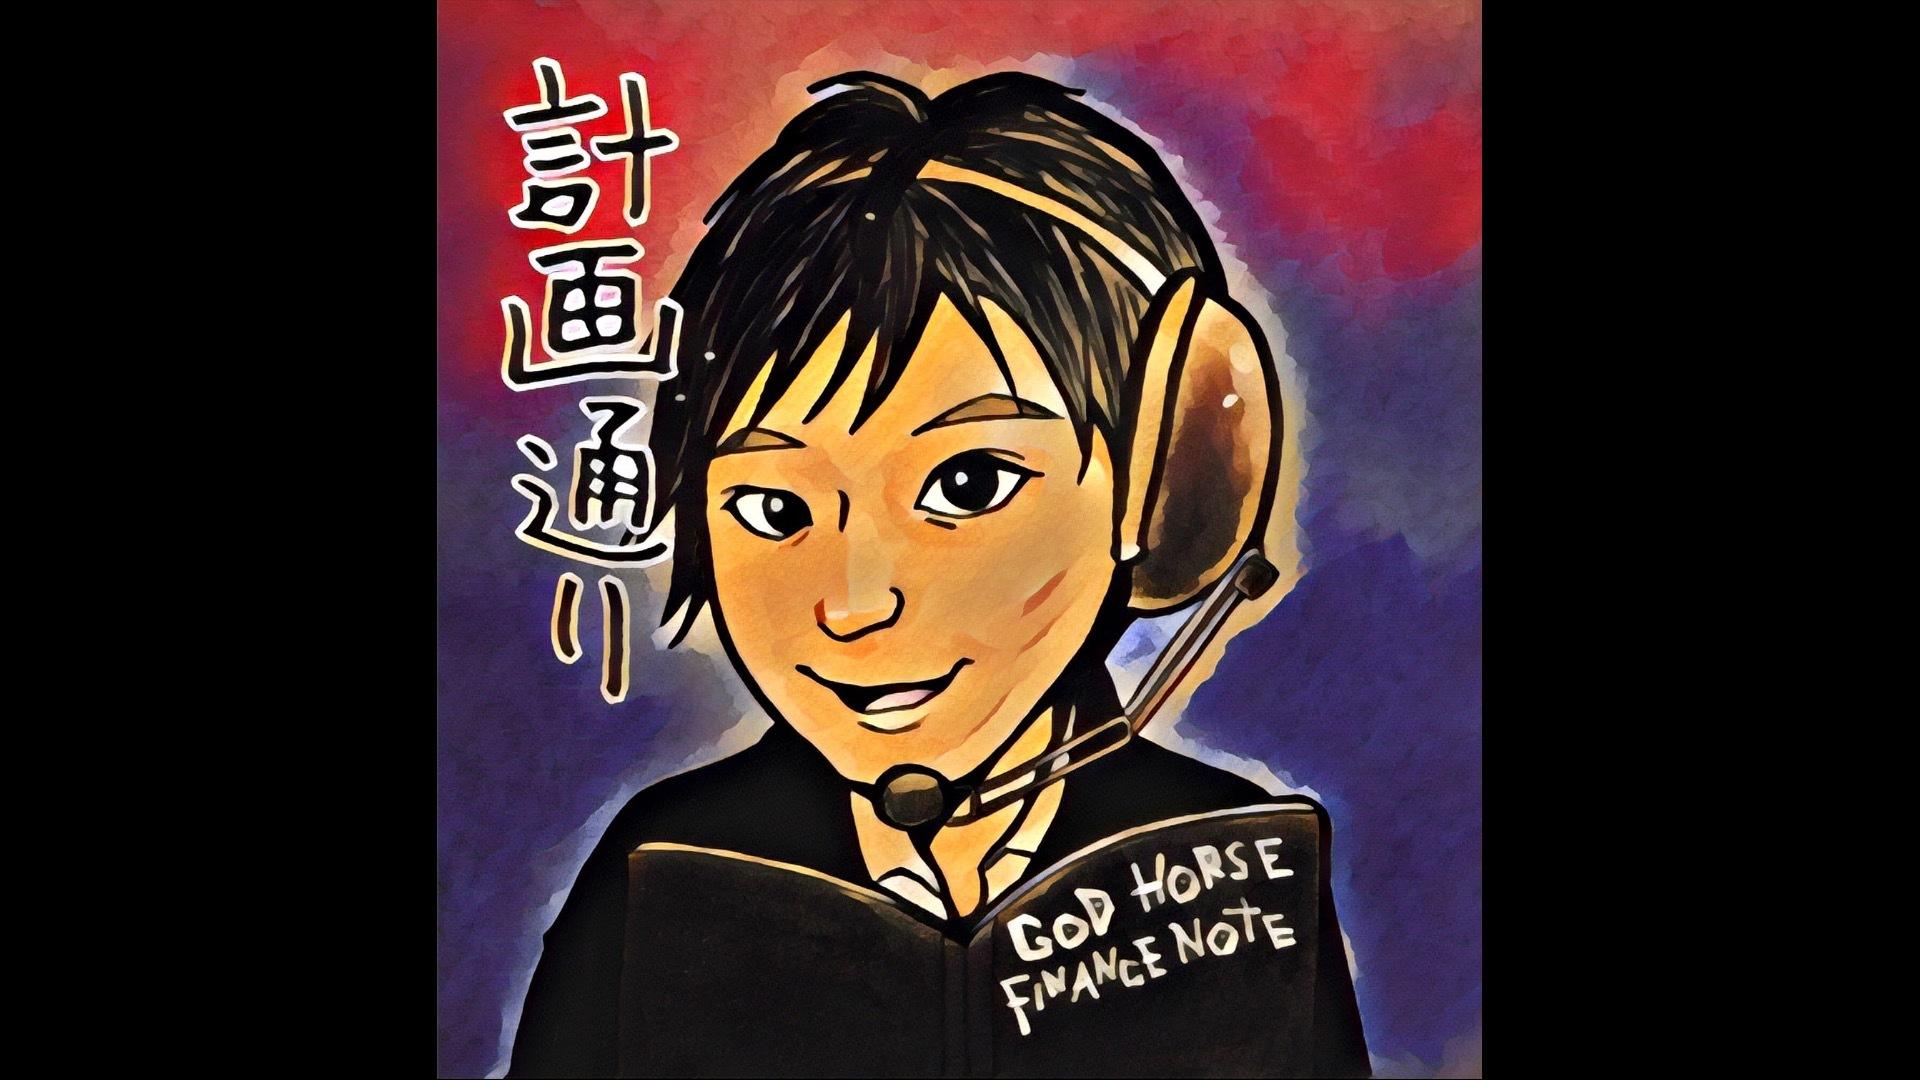 akky / 馬神 傑 / 新宿最強馬券師 / モーリー